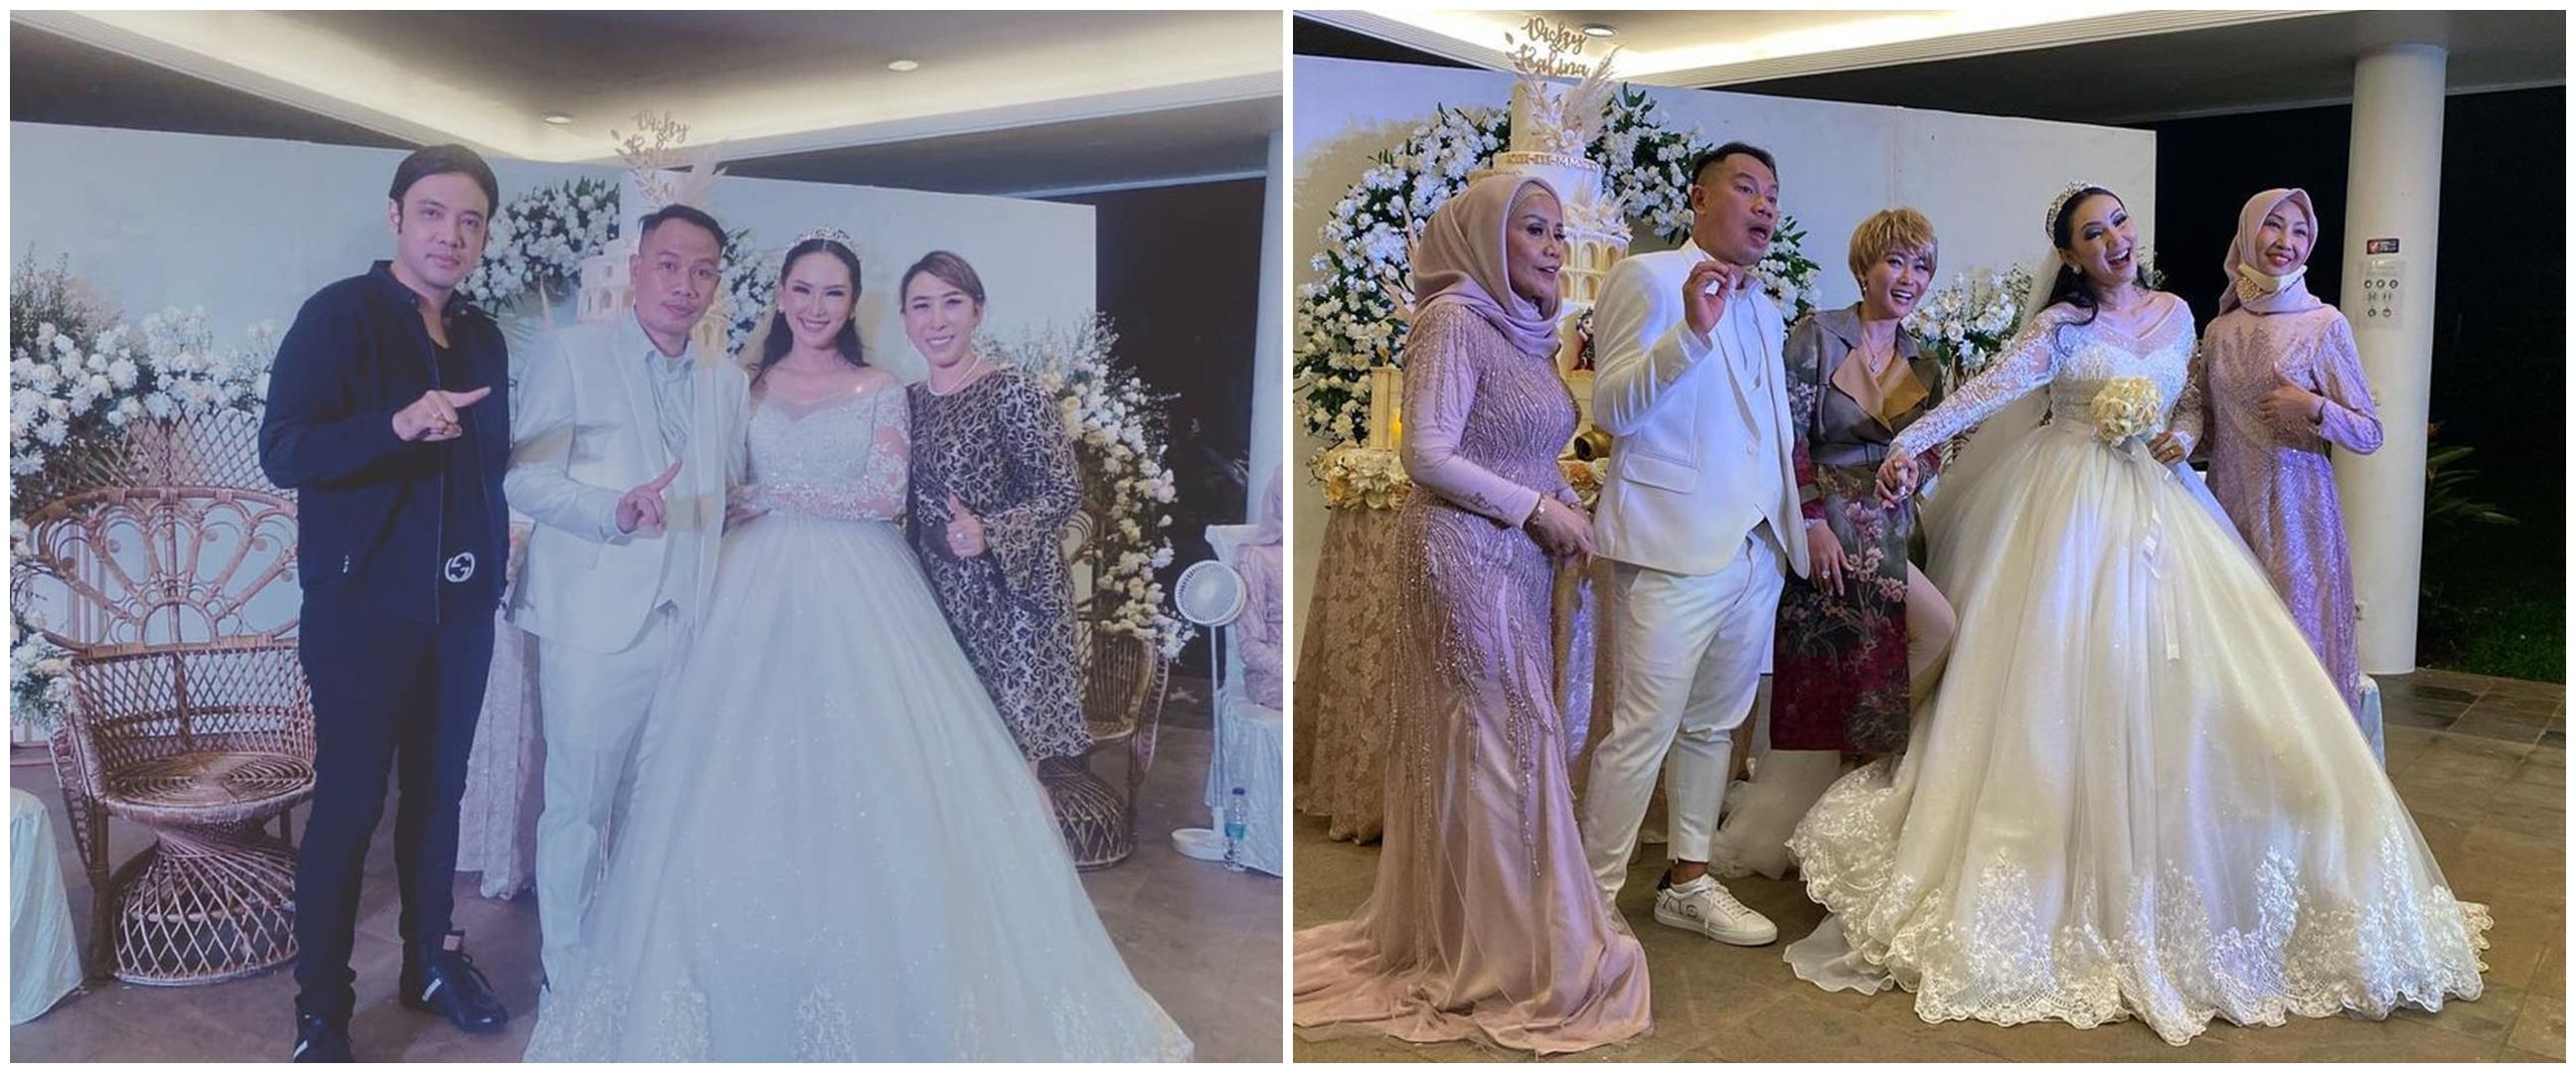 Gaya 7 seleb di pernikahan Kalina-Vicky, Celine Evangelista manglingi